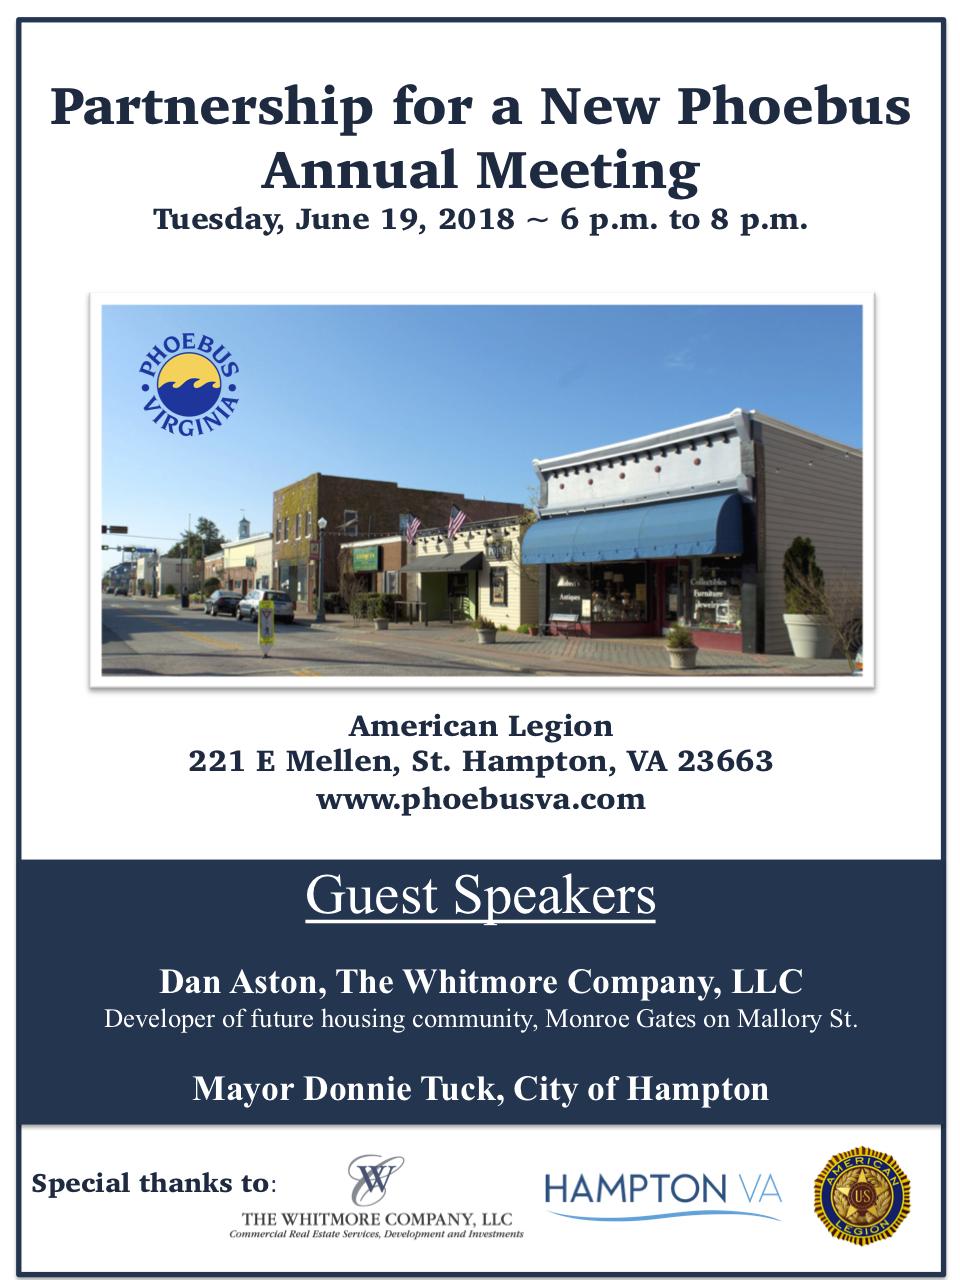 Annual Meeting Flyer.jpg